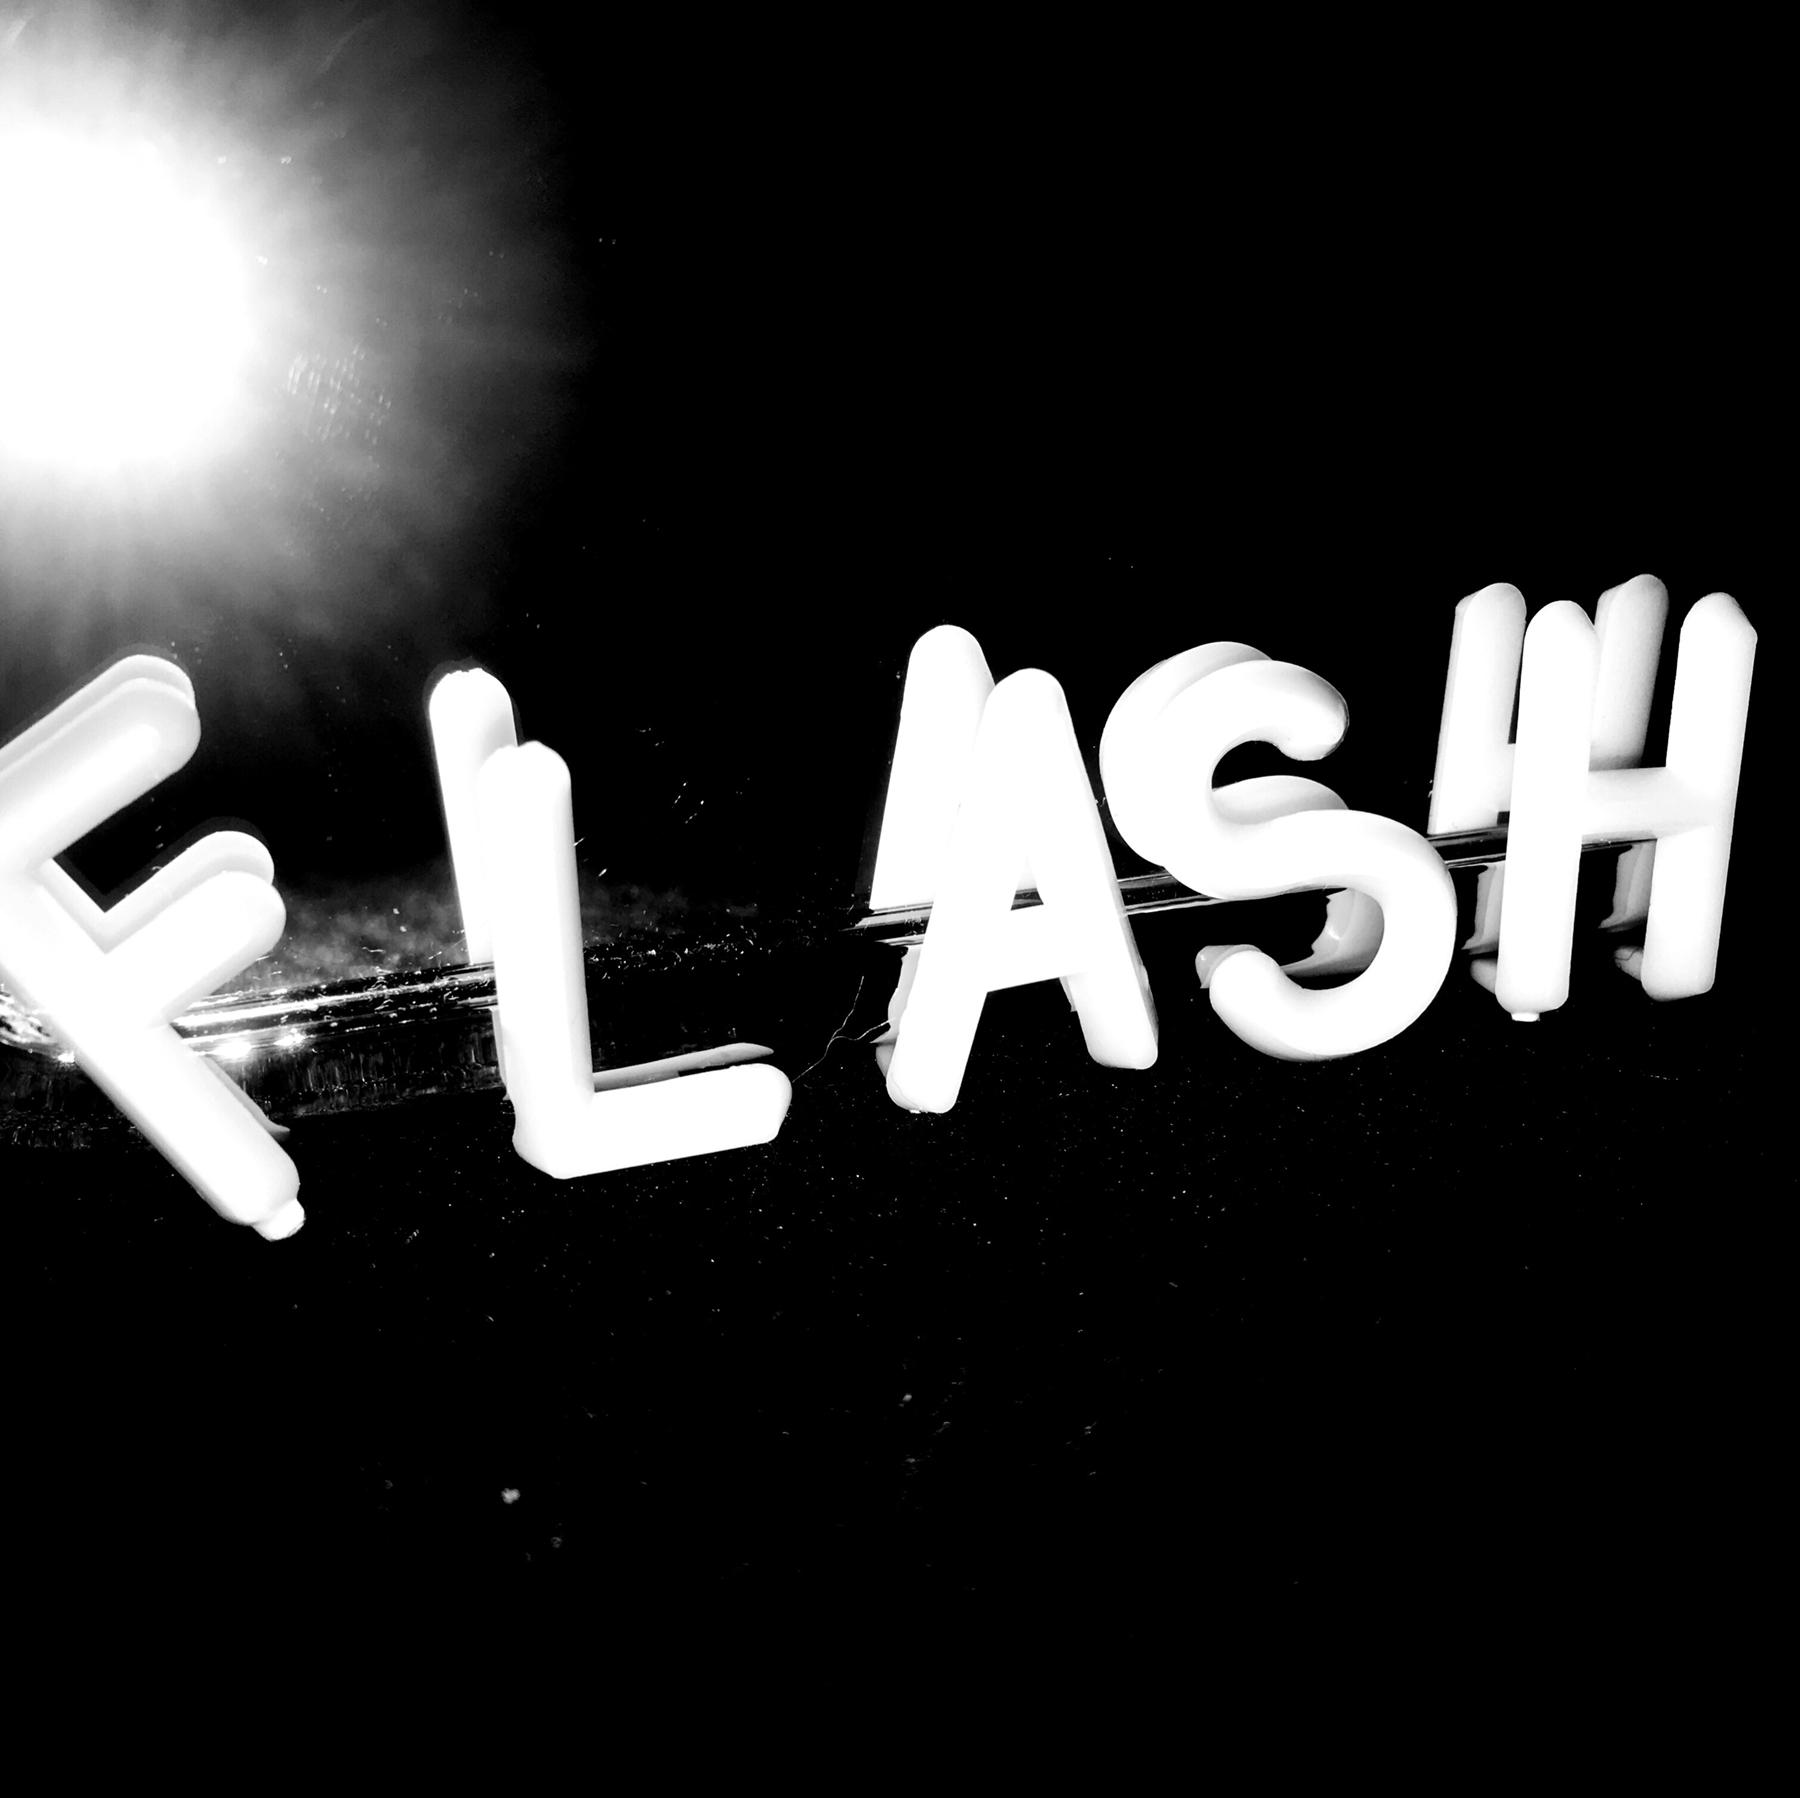 Trevor_Messersmith_Flash.JPG